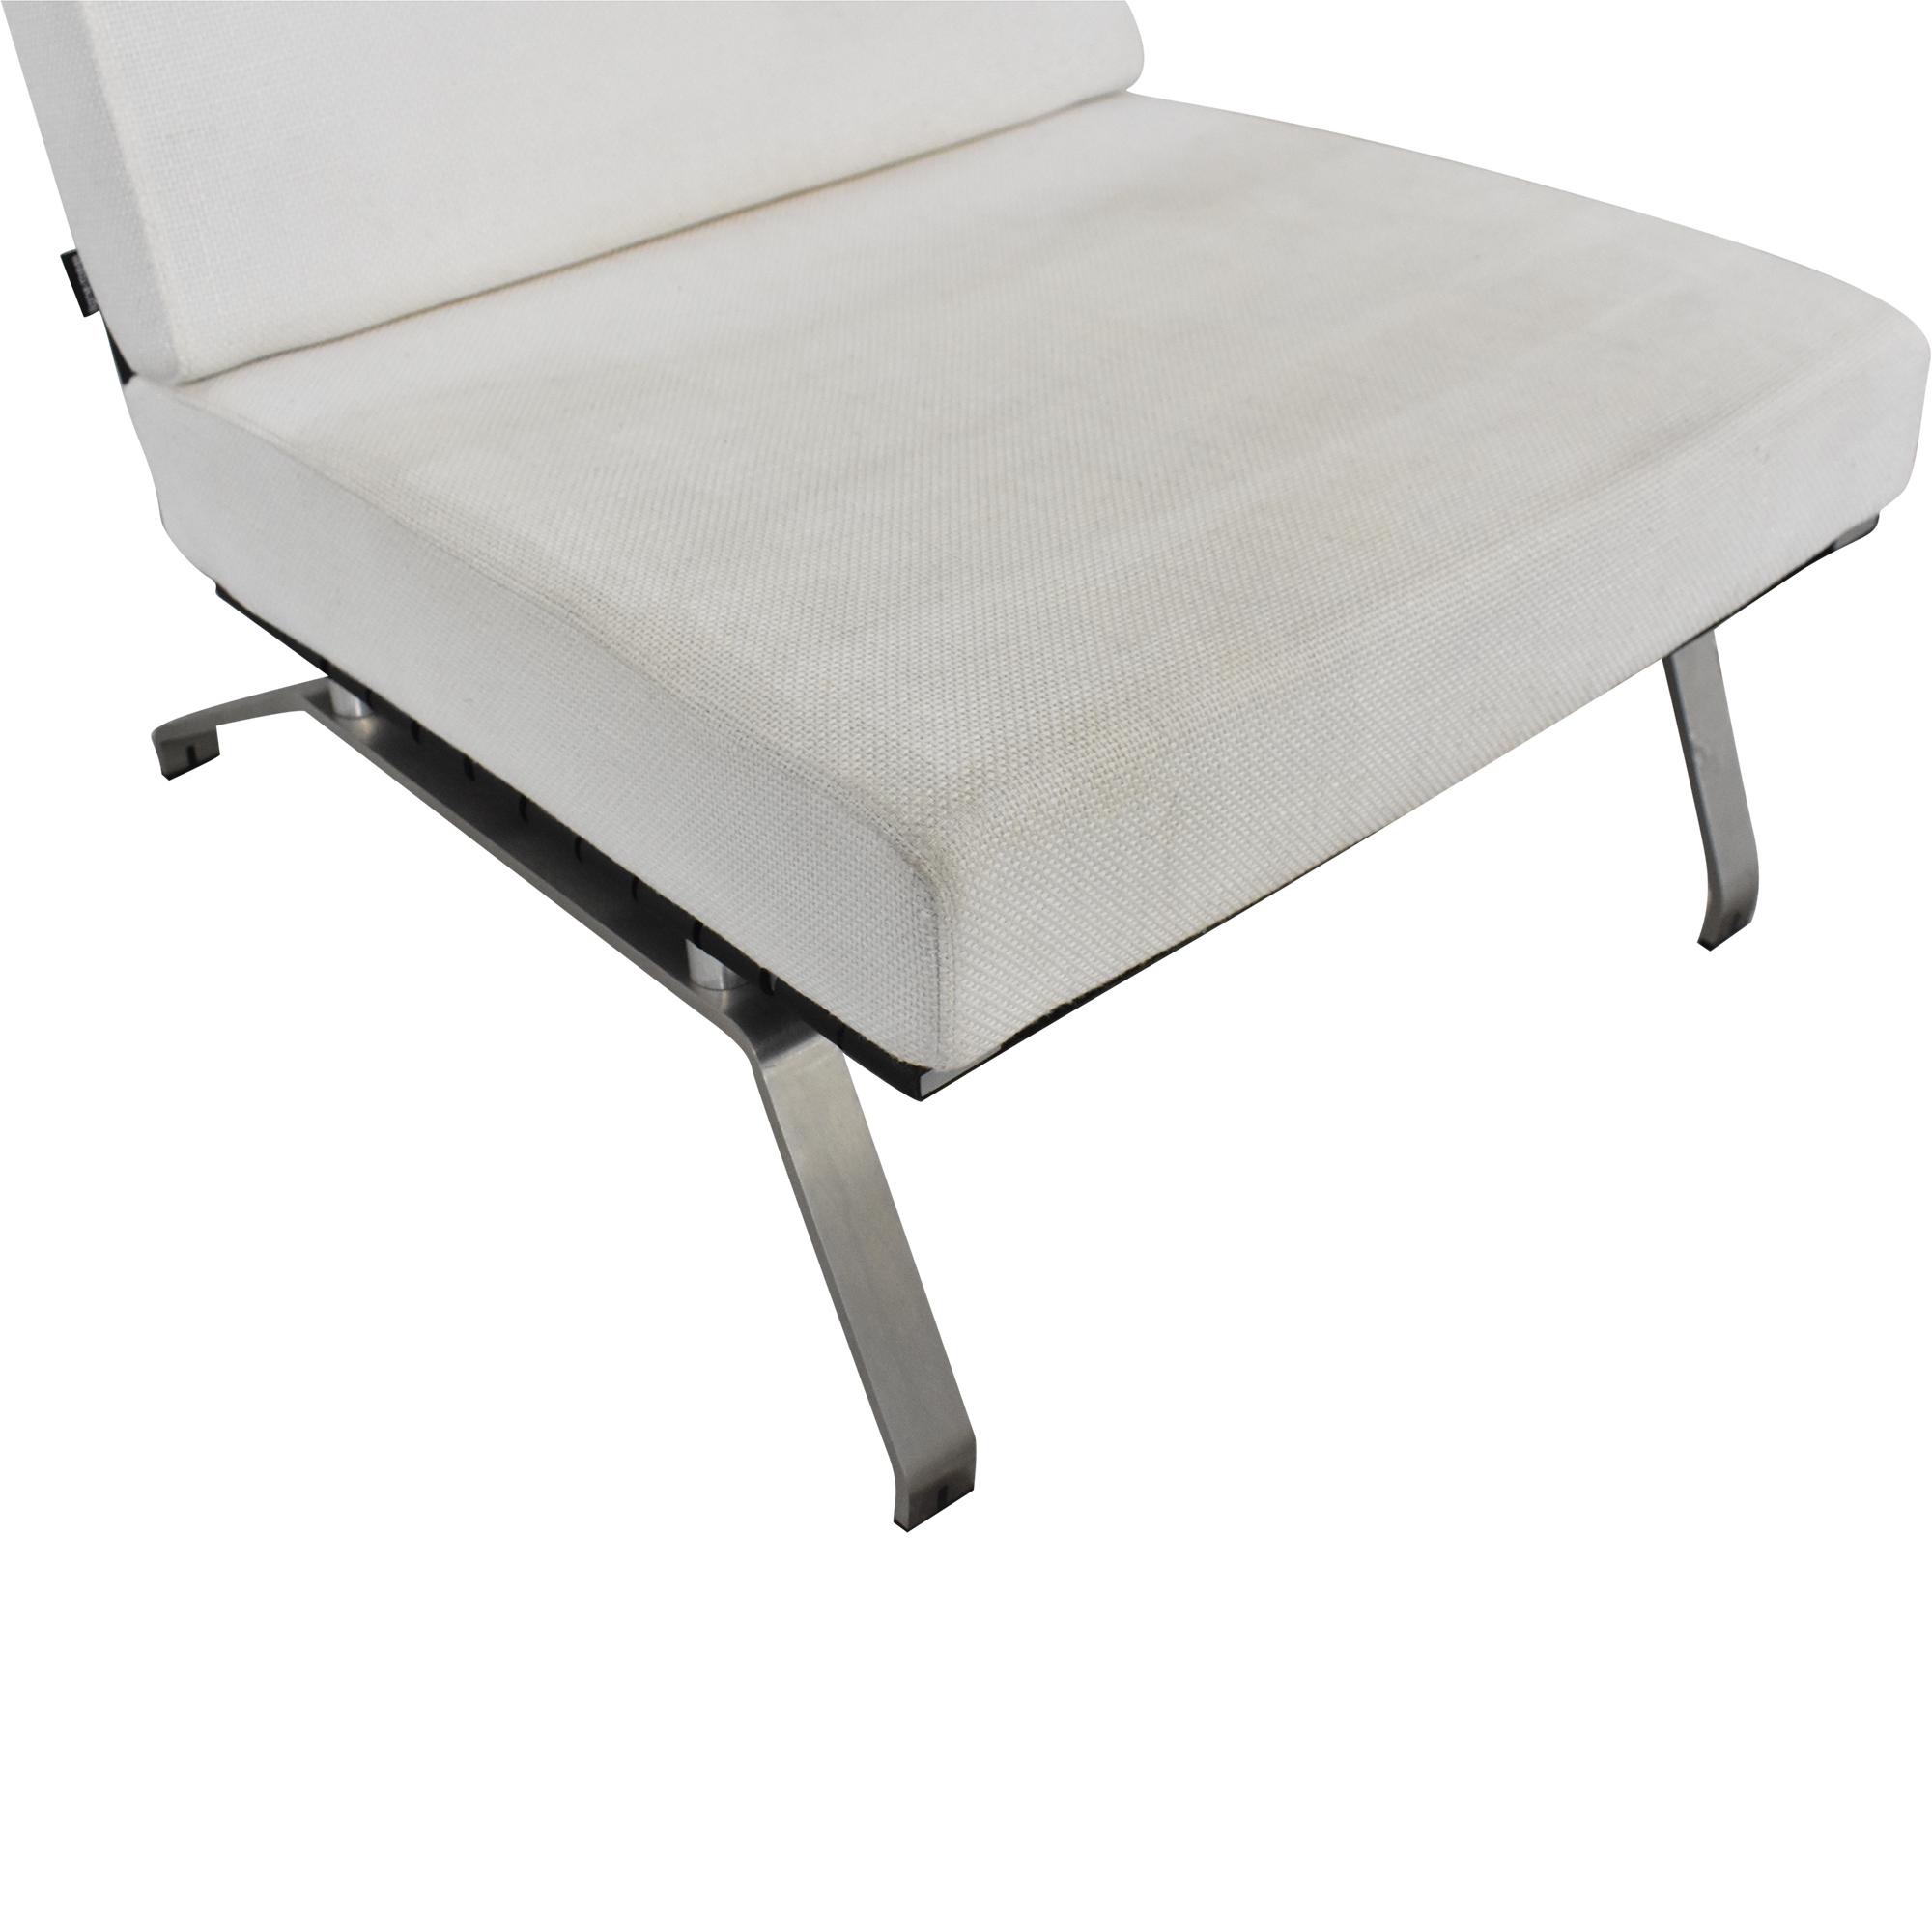 Ligne Roset Ligne Roset Flexus Chair on sale